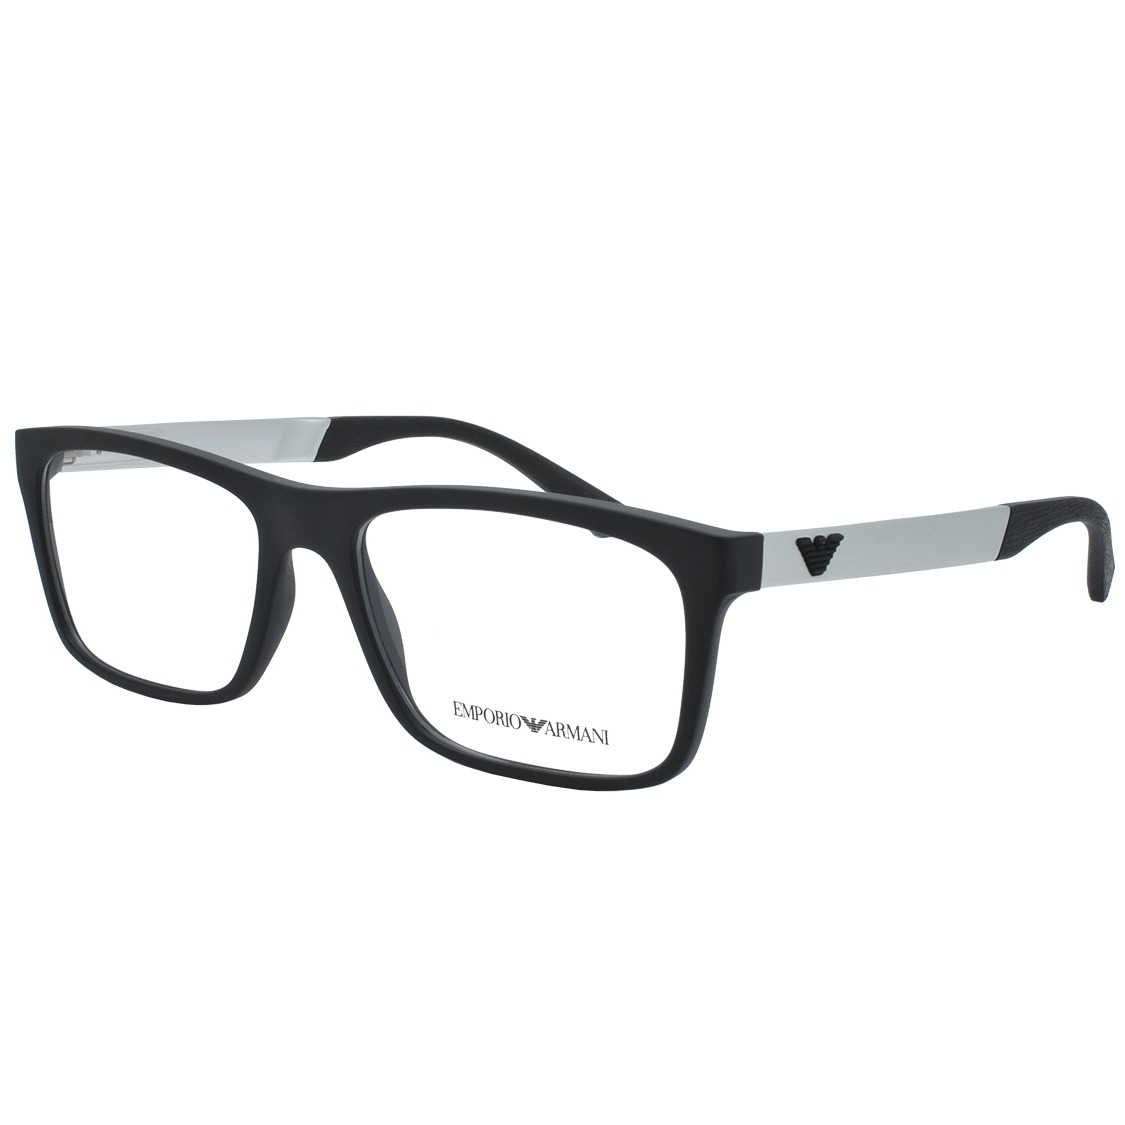 óculos de grau emporio armani masculino original ea3101 5042. Carregando  zoom. cb1b503f2a